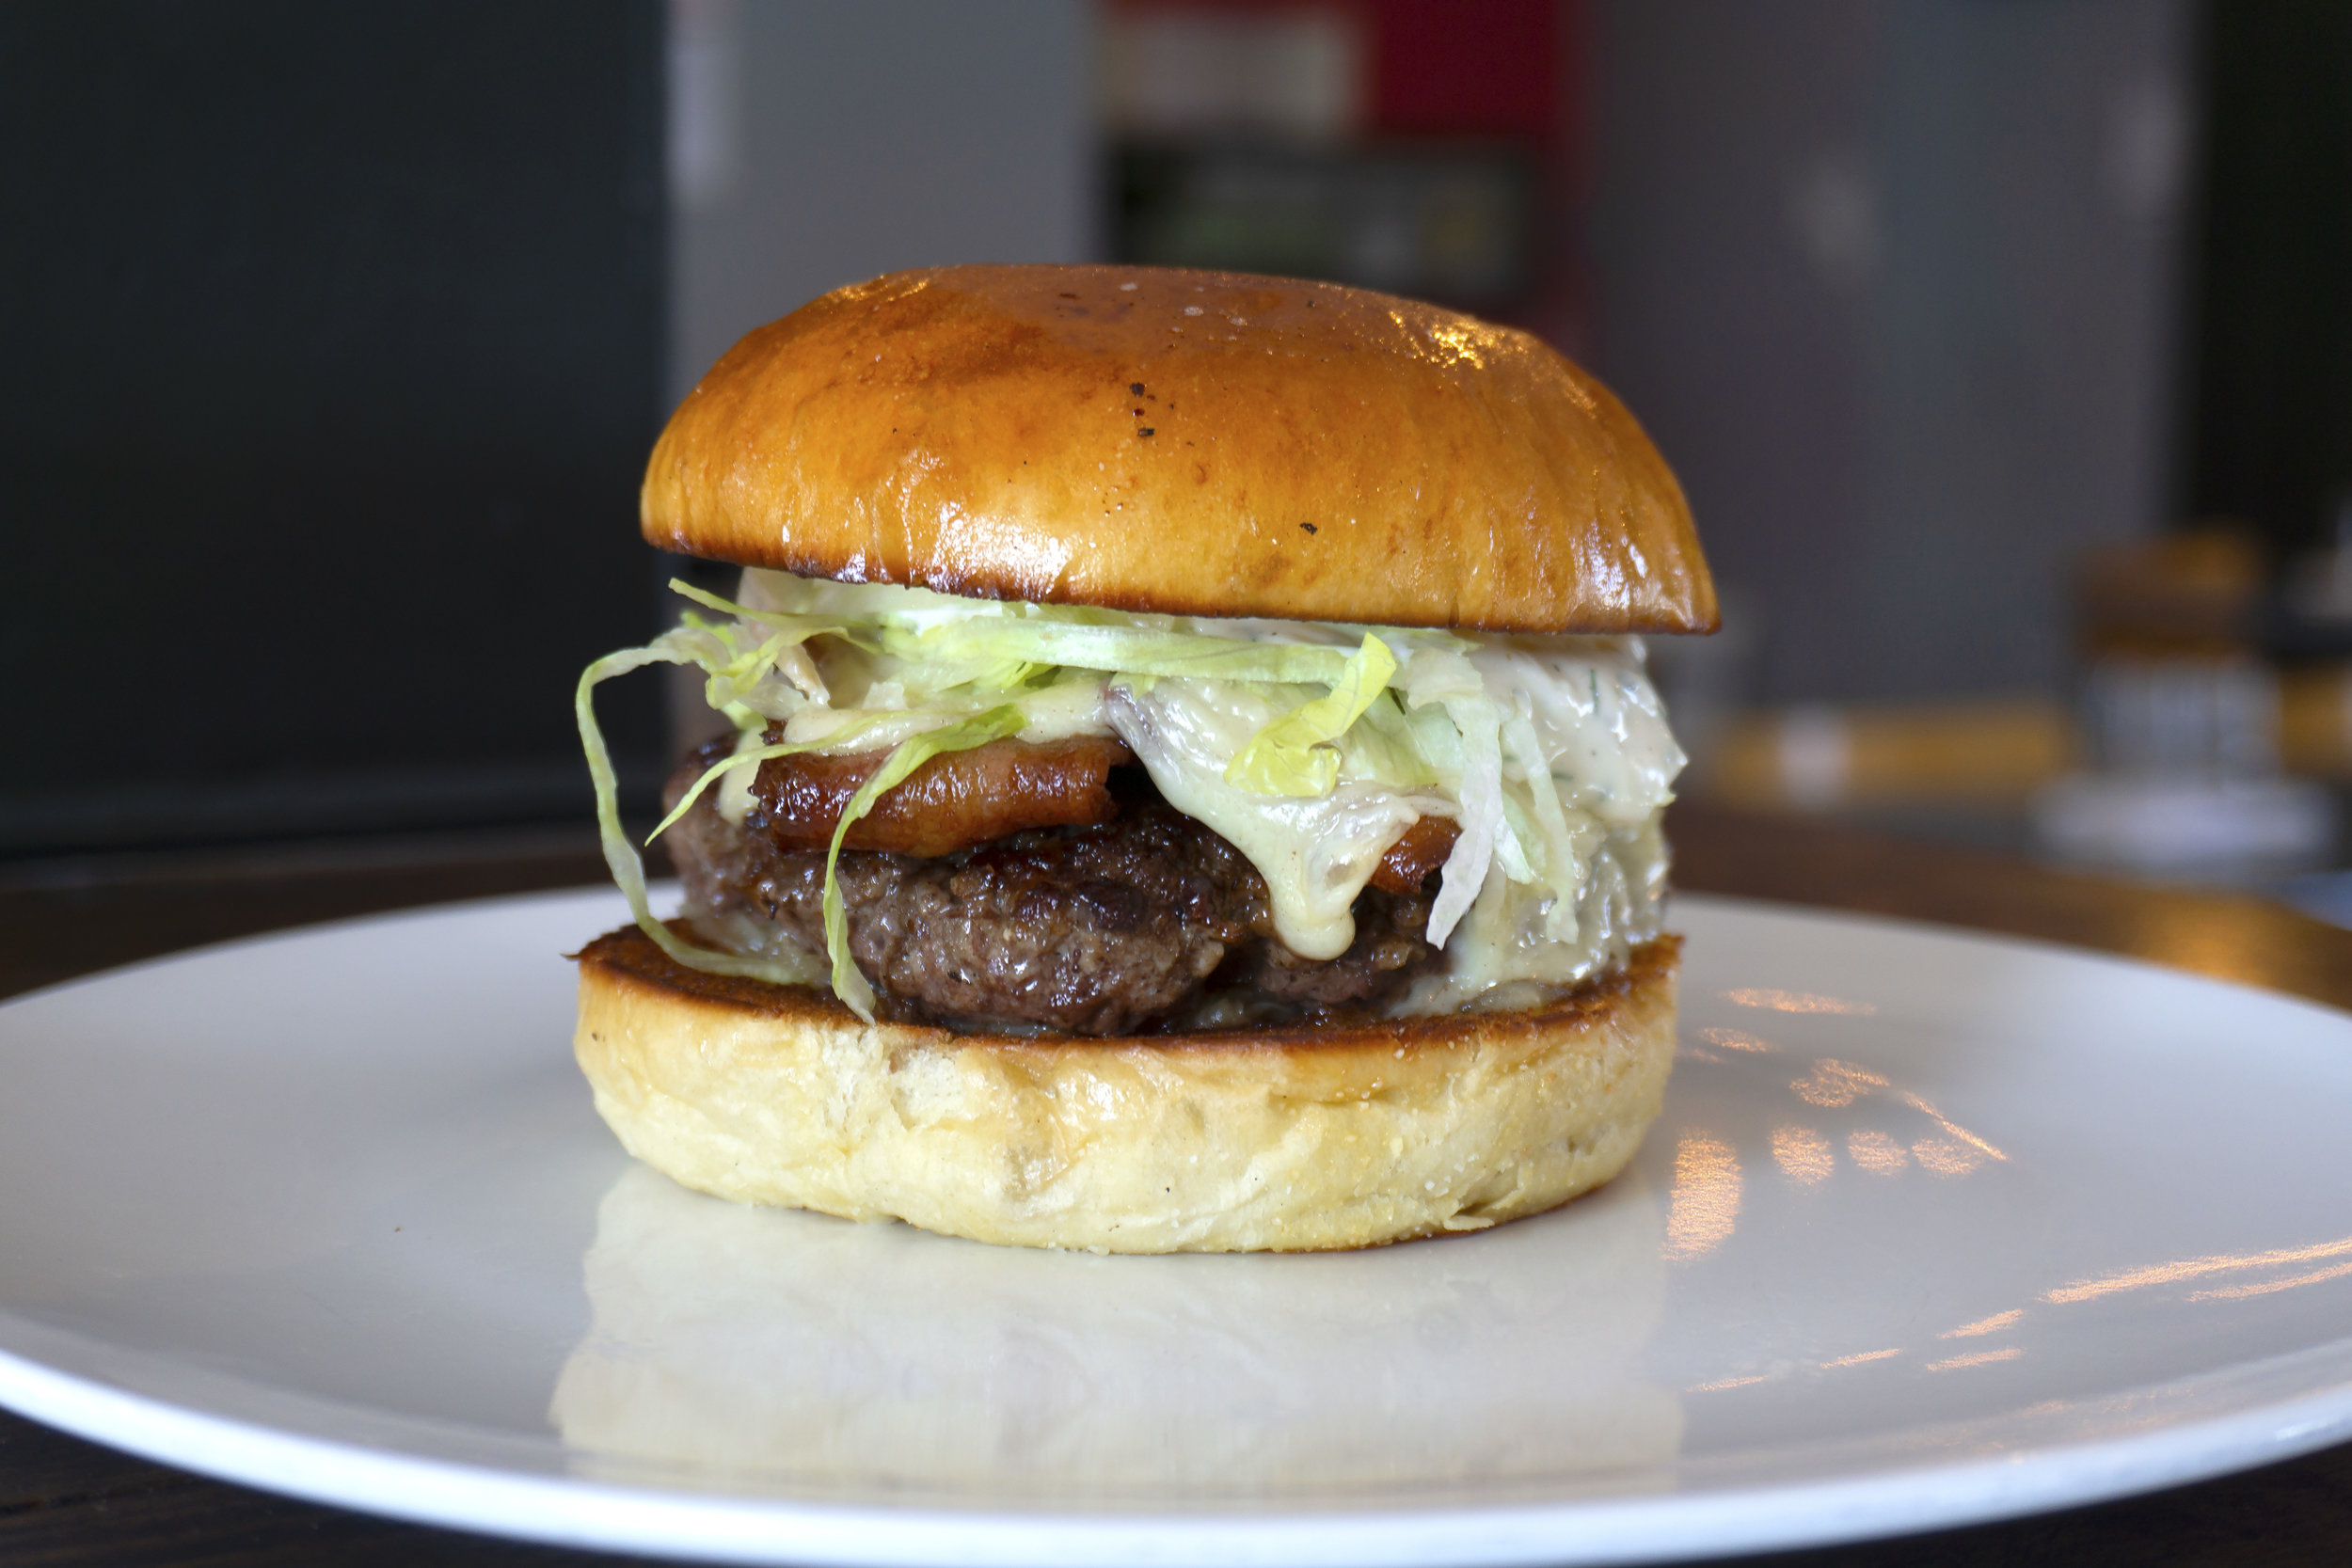 brioche bun, hand pressed angus beef patty, onion jam, cucumber dill mayo, bacon, swiss, shredded lettuce